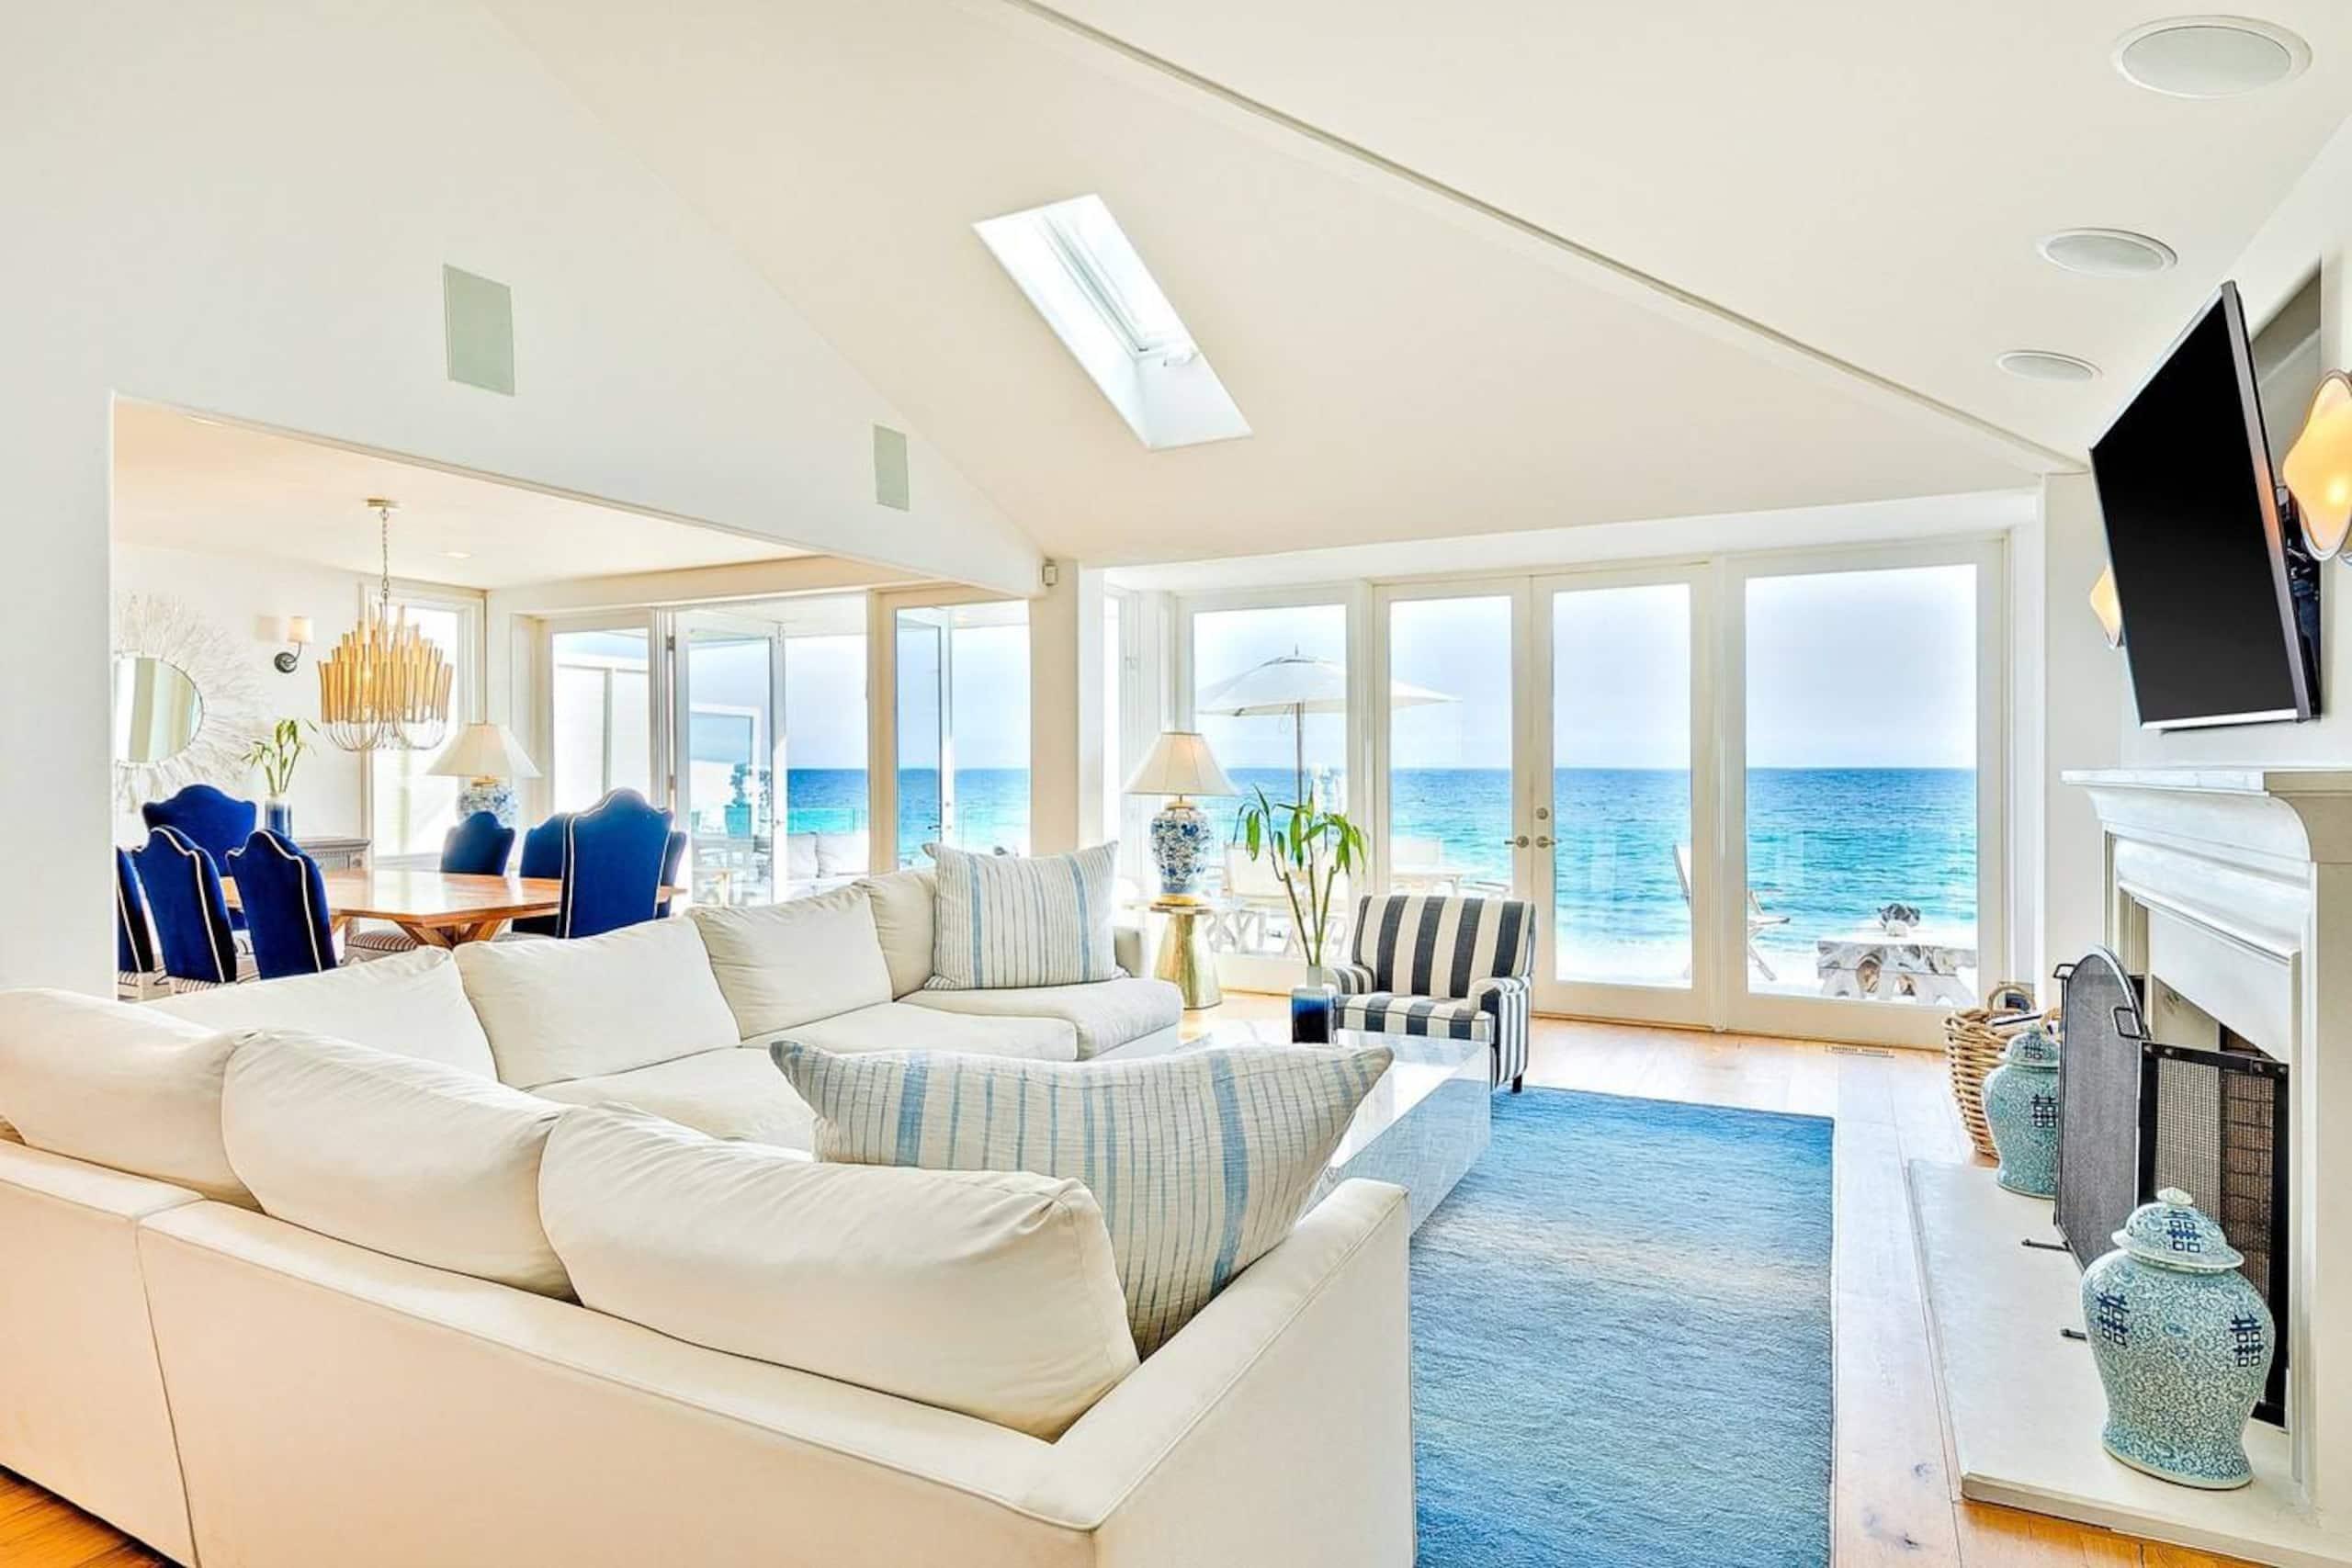 Apartment Villa Shawaiz - Beachfront Villa with 5 beds  photo 20352076